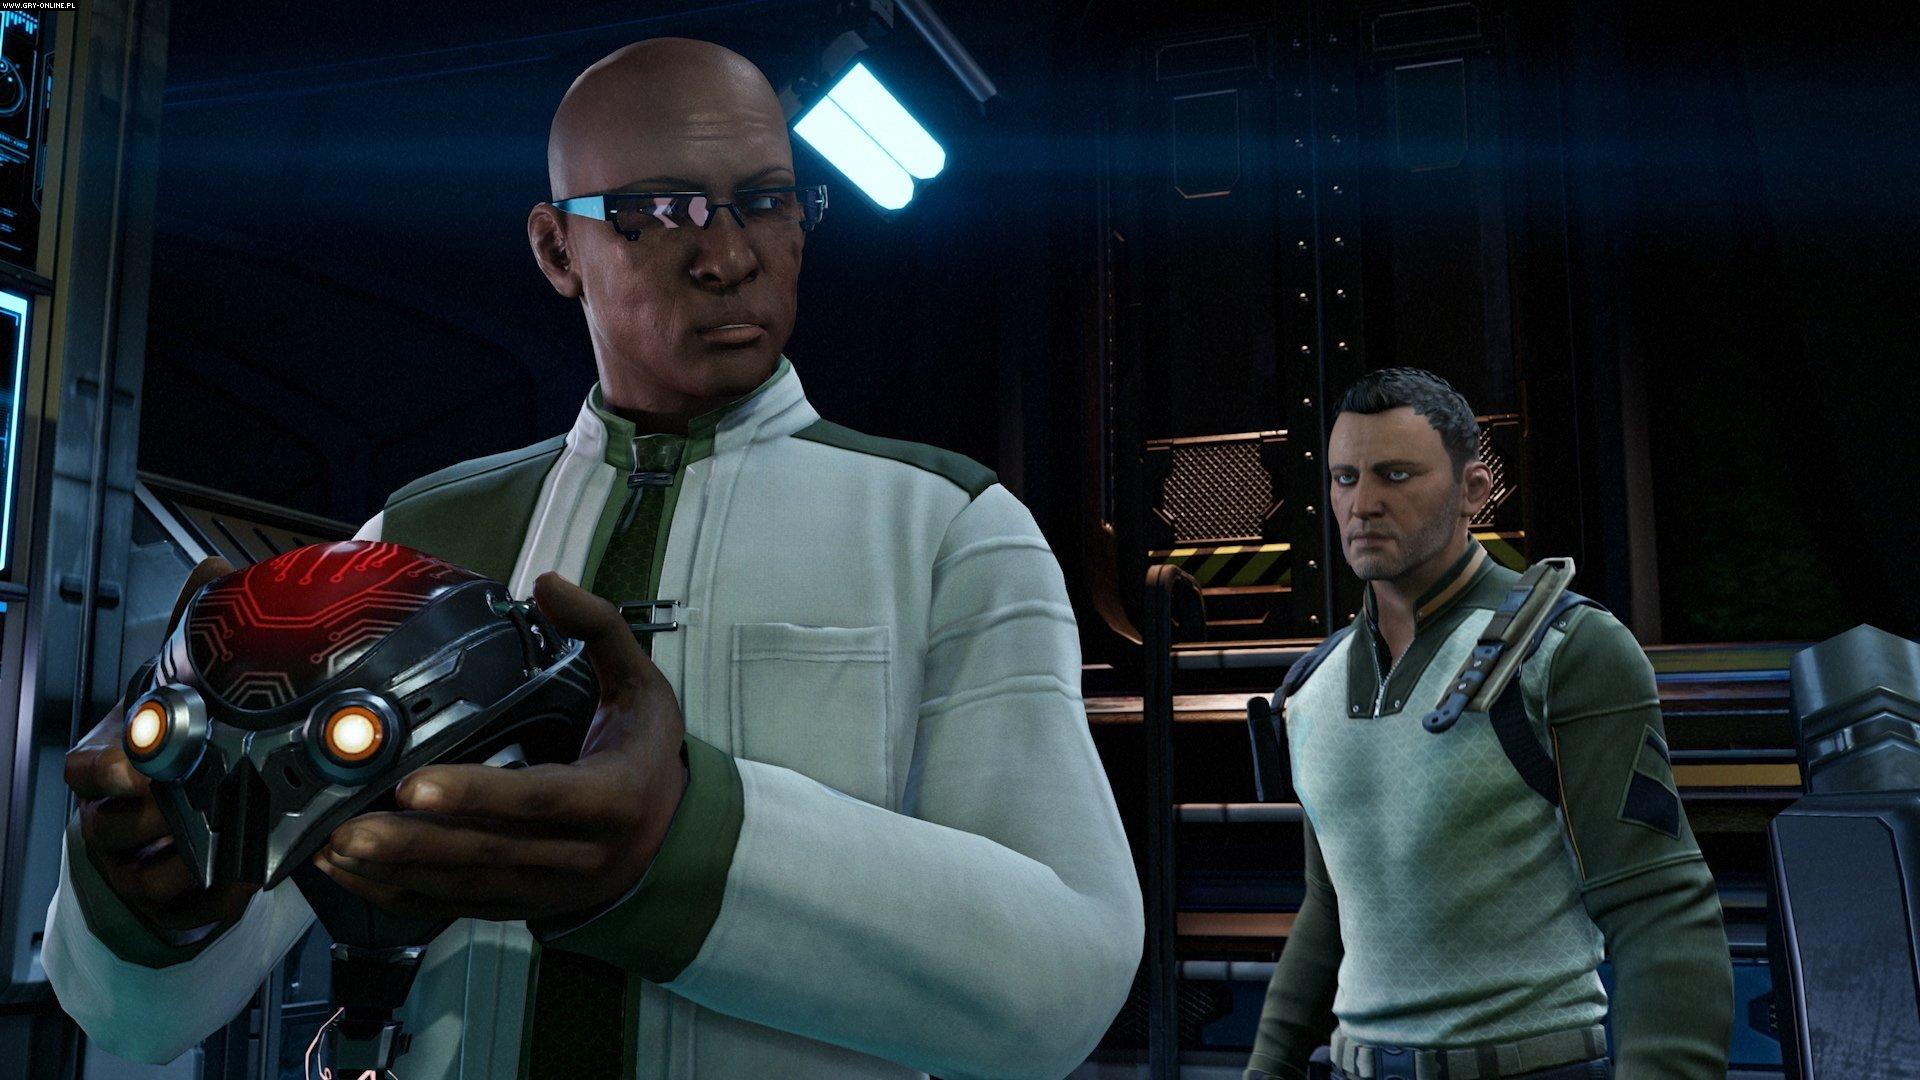 XCOM 2 PS4, XONE Games Image 20/176, Firaxis Games, 2K Games